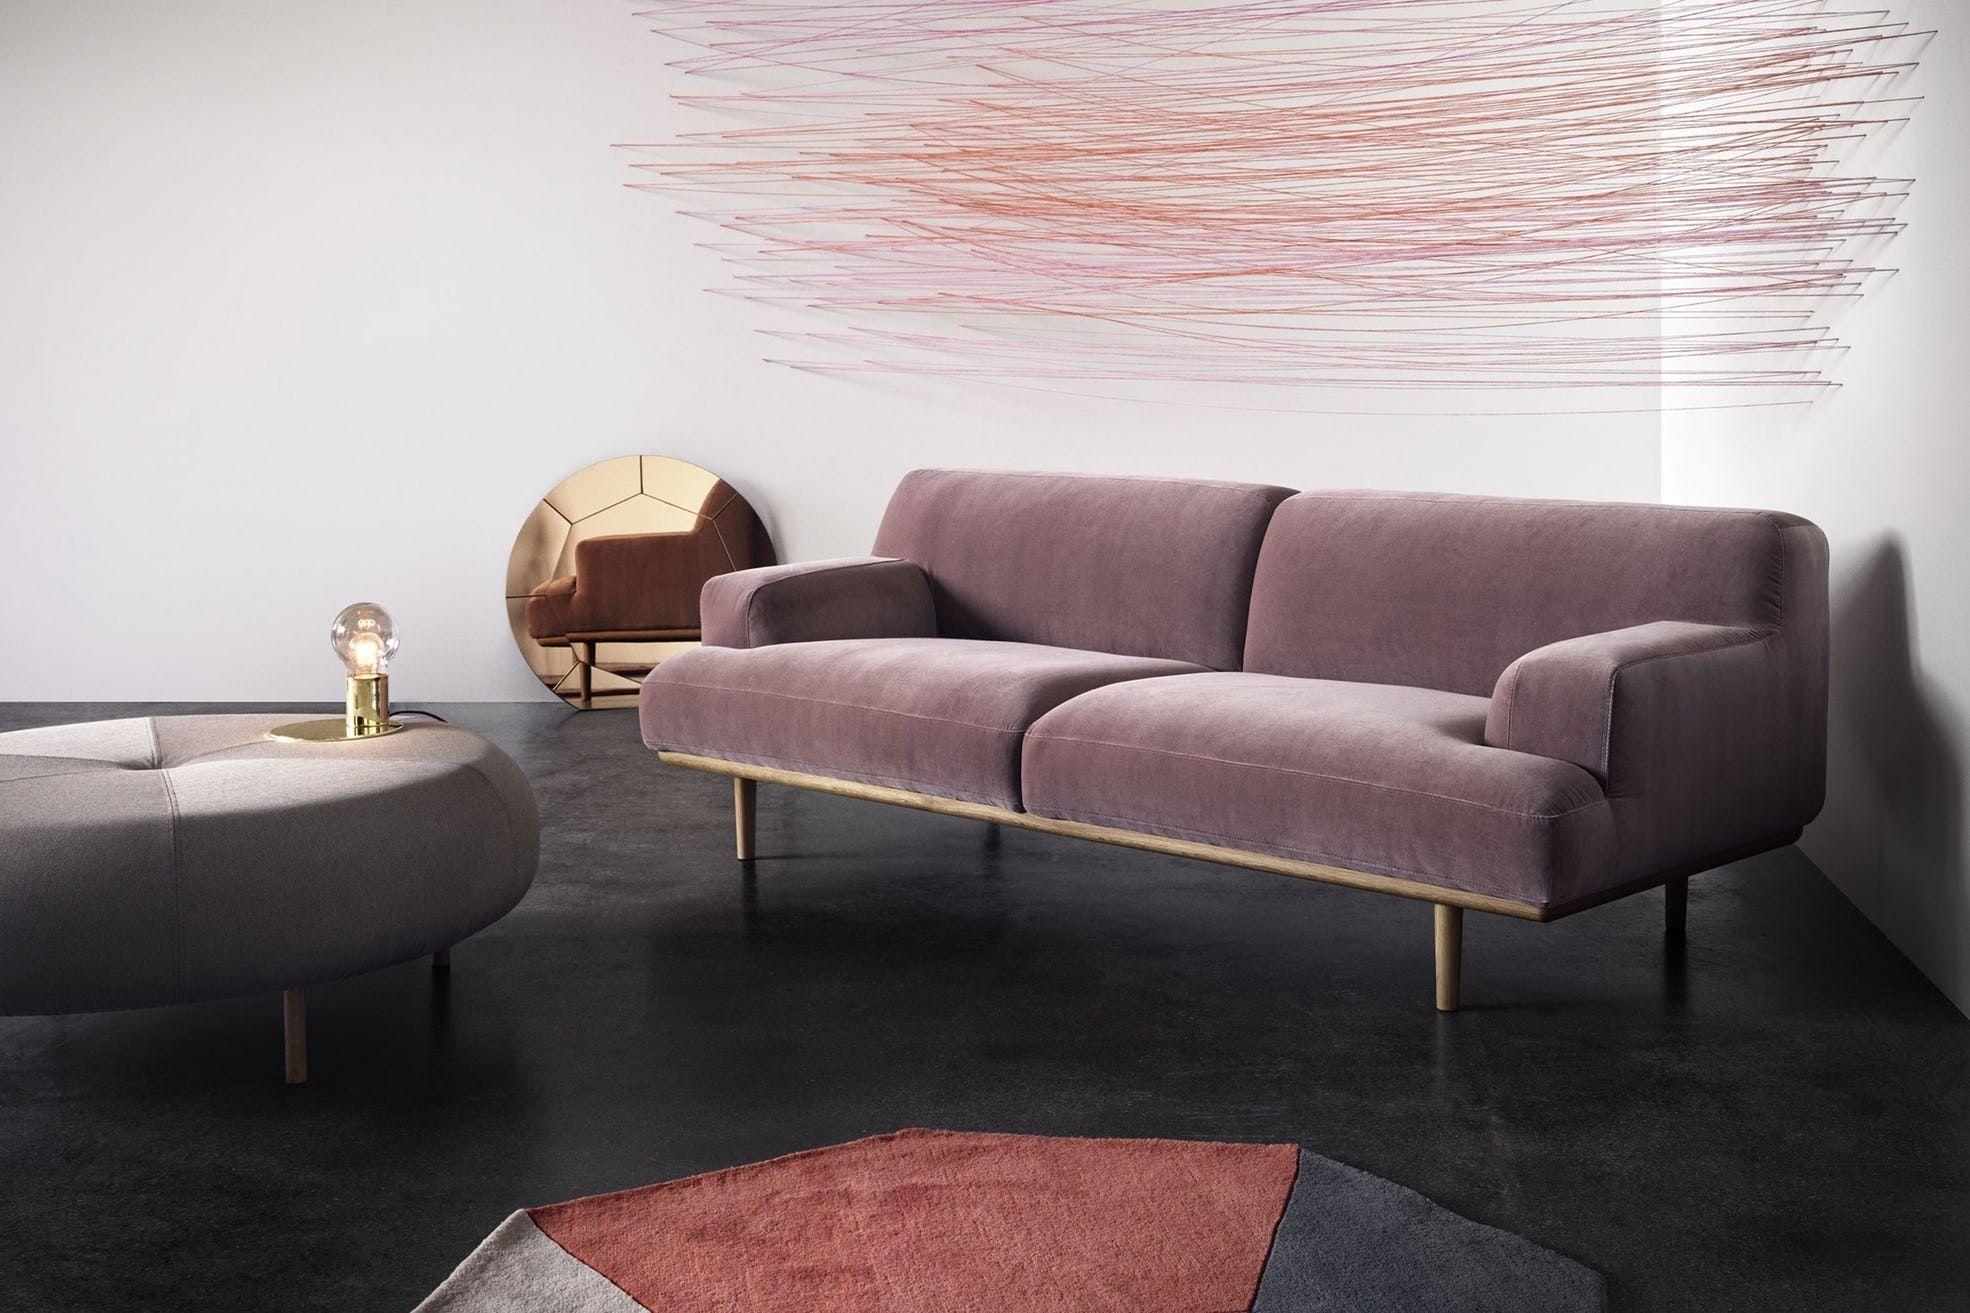 Madison Sofa By Linteloo Sofa Contemporary Furniture Design